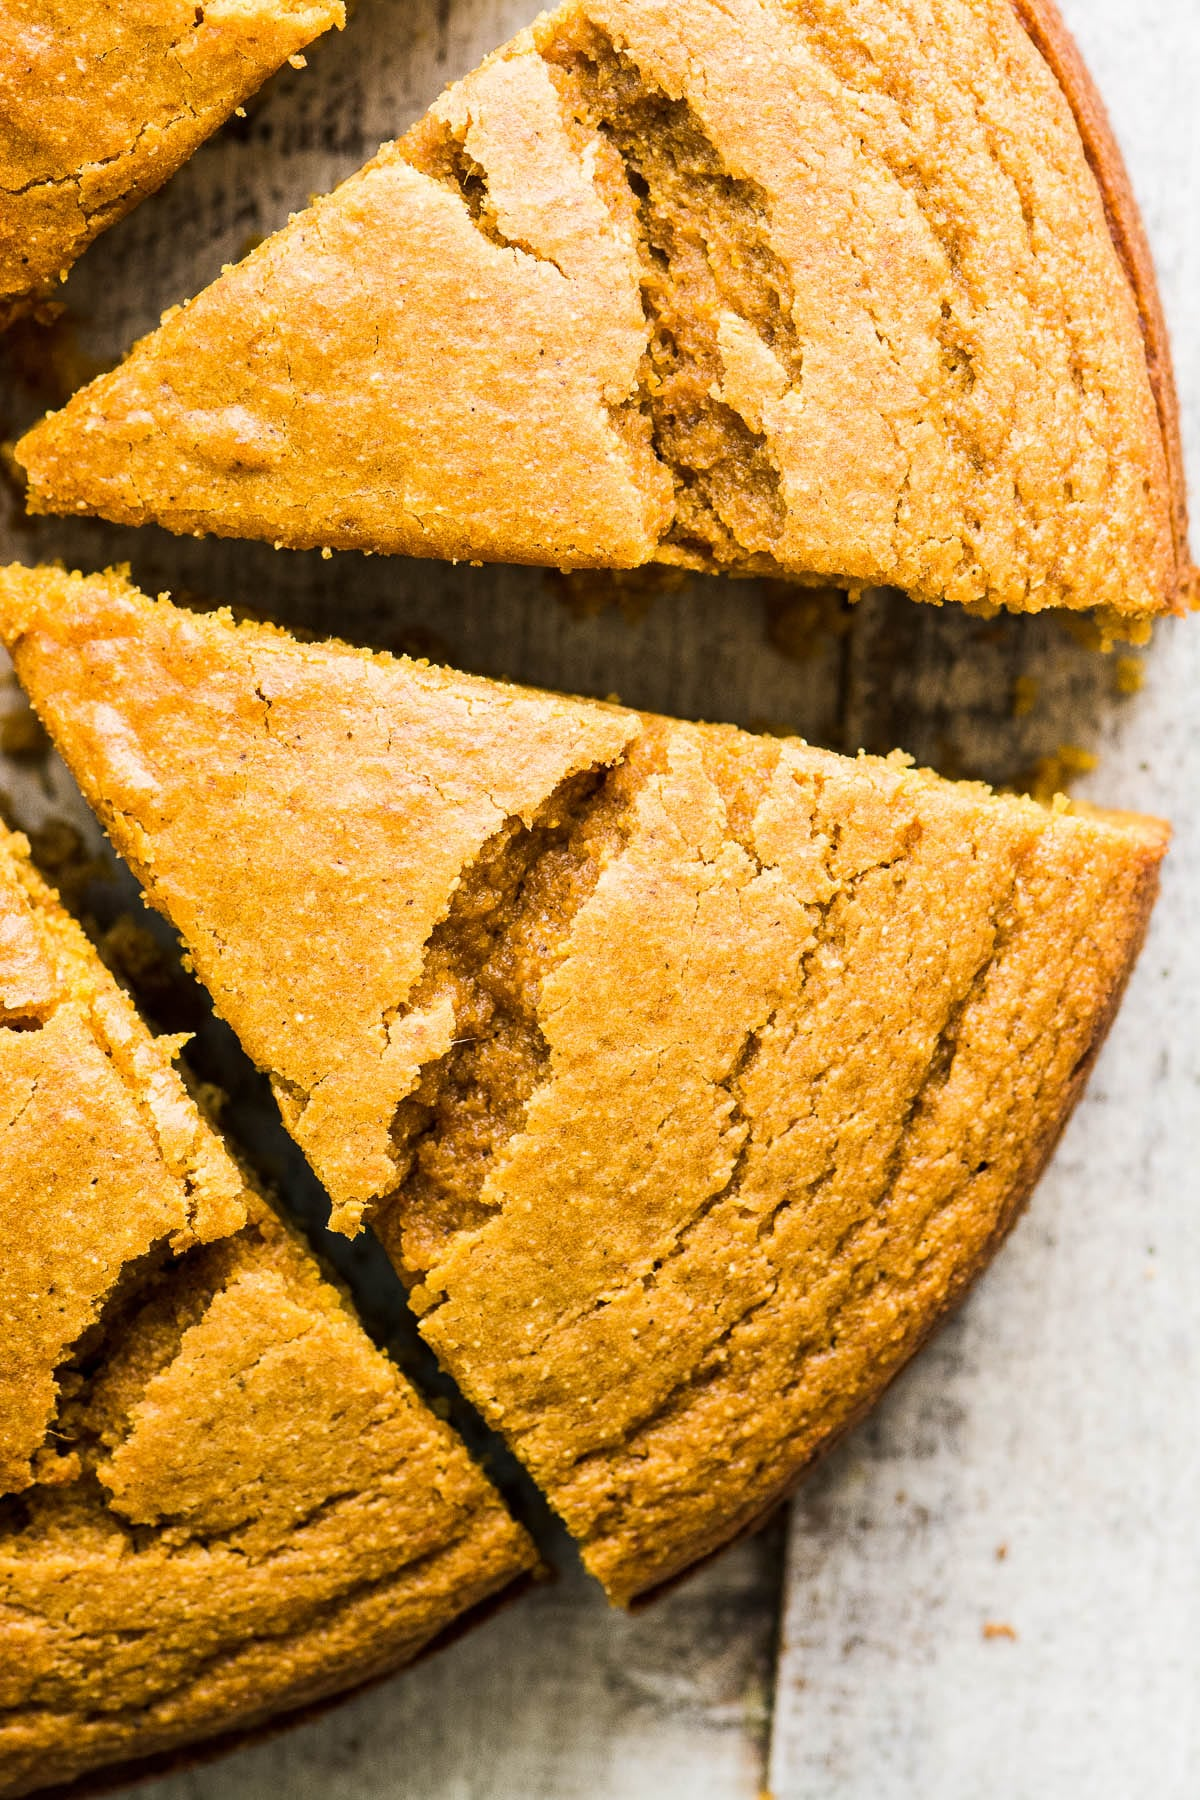 Pumpkin Cornbread, sliced into wedges